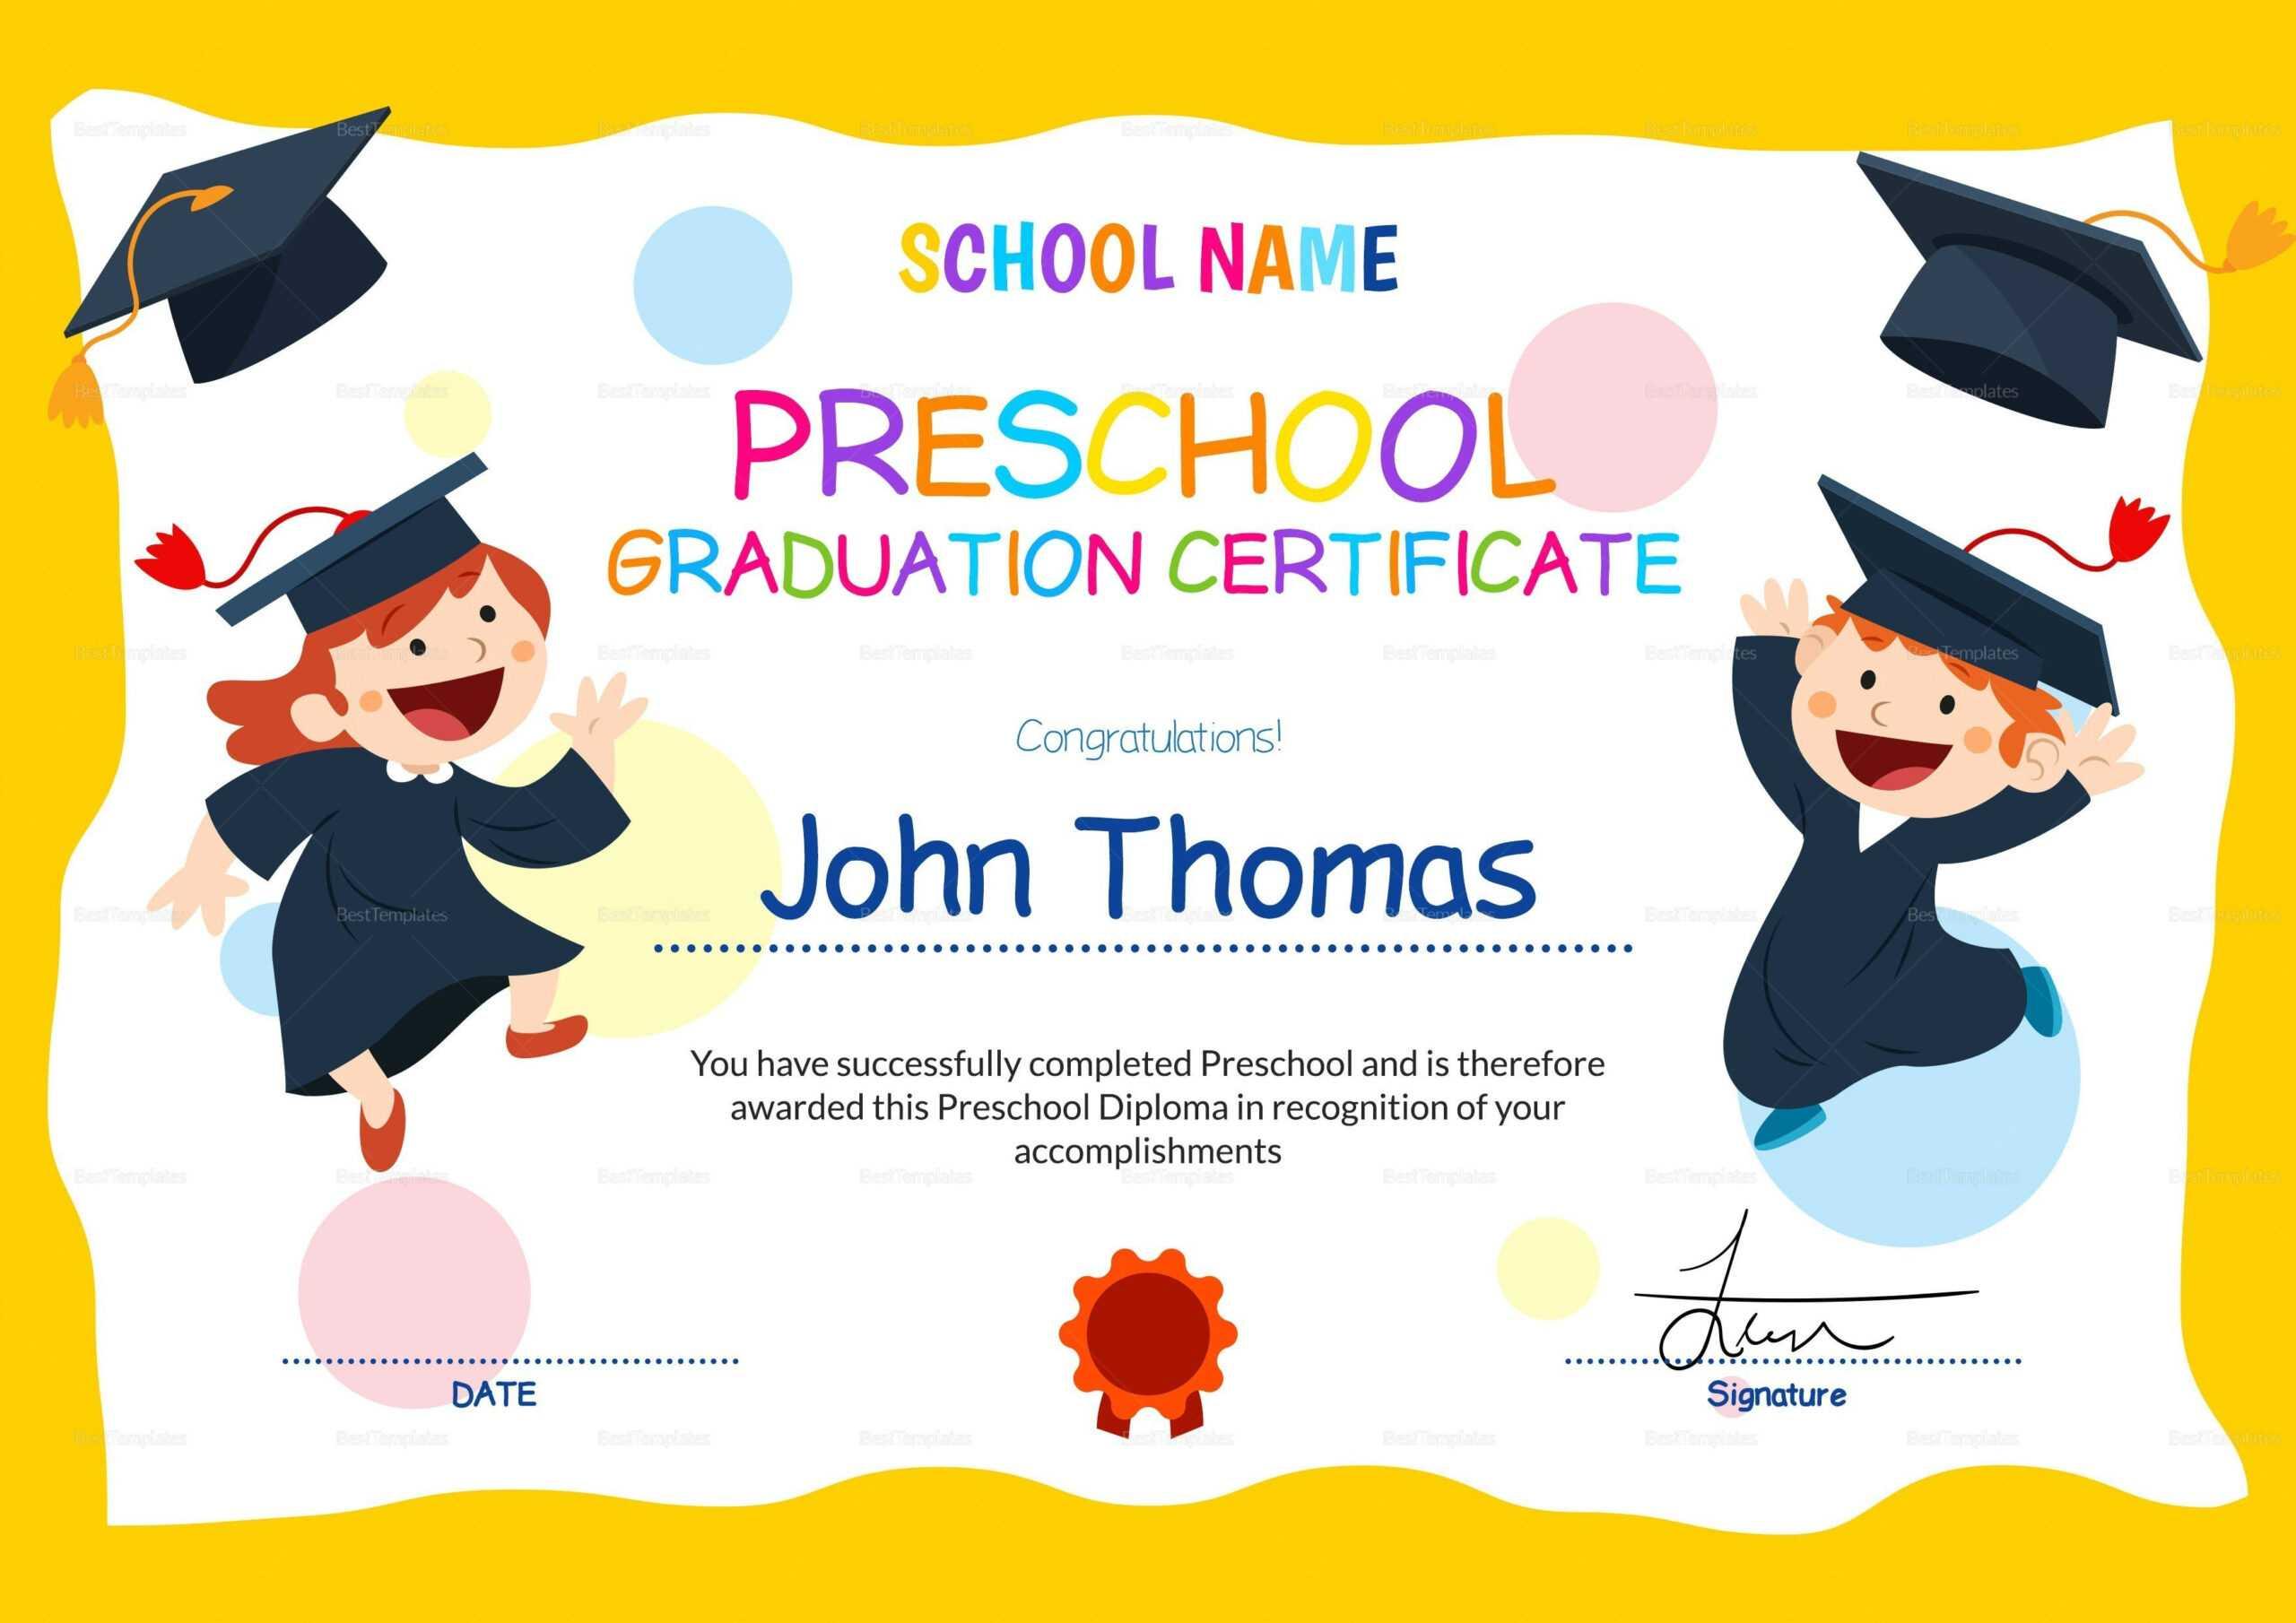 12 Unique Preschool Graduation Certificate Template Free With Free Printable Graduation Certificate Templates